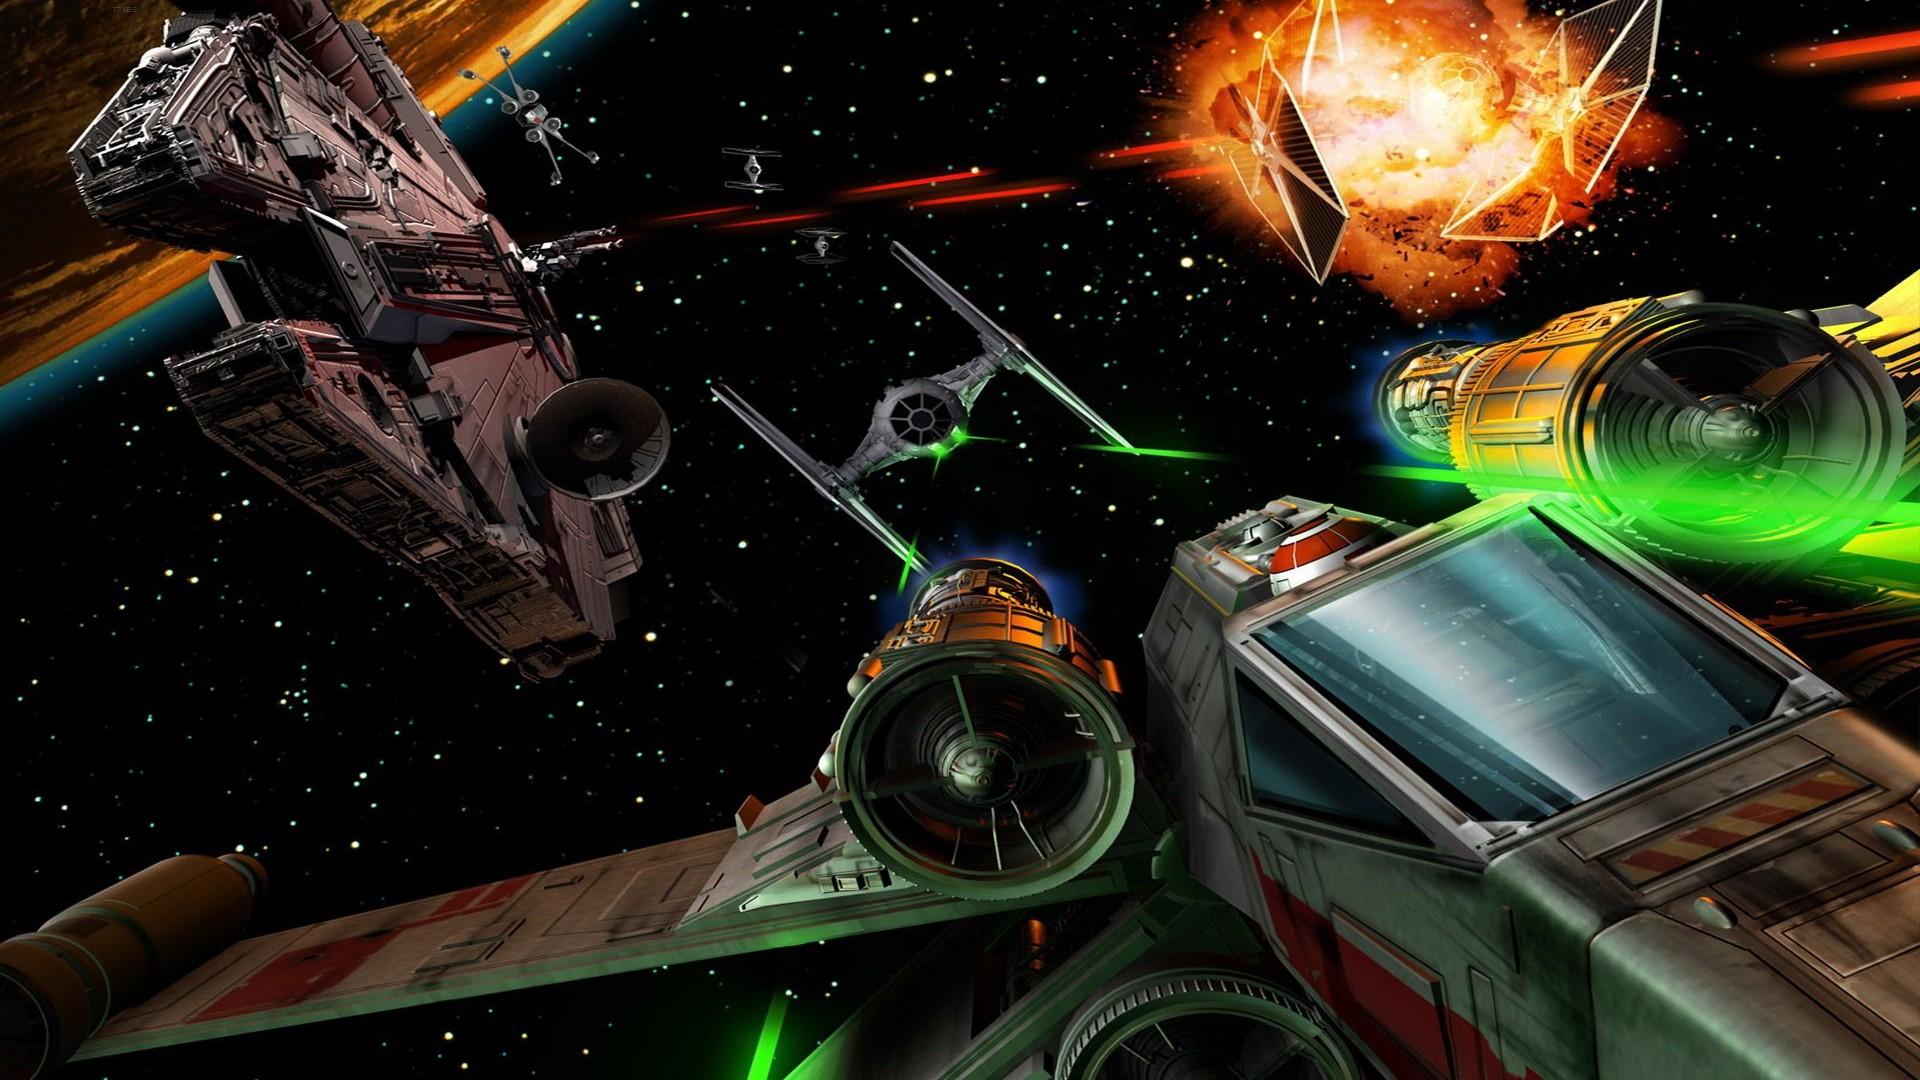 star-wars-millennium-falcon-space-ship-combat-action-adventure-wallpaper-widescreen-hd-1920x1080.jpg